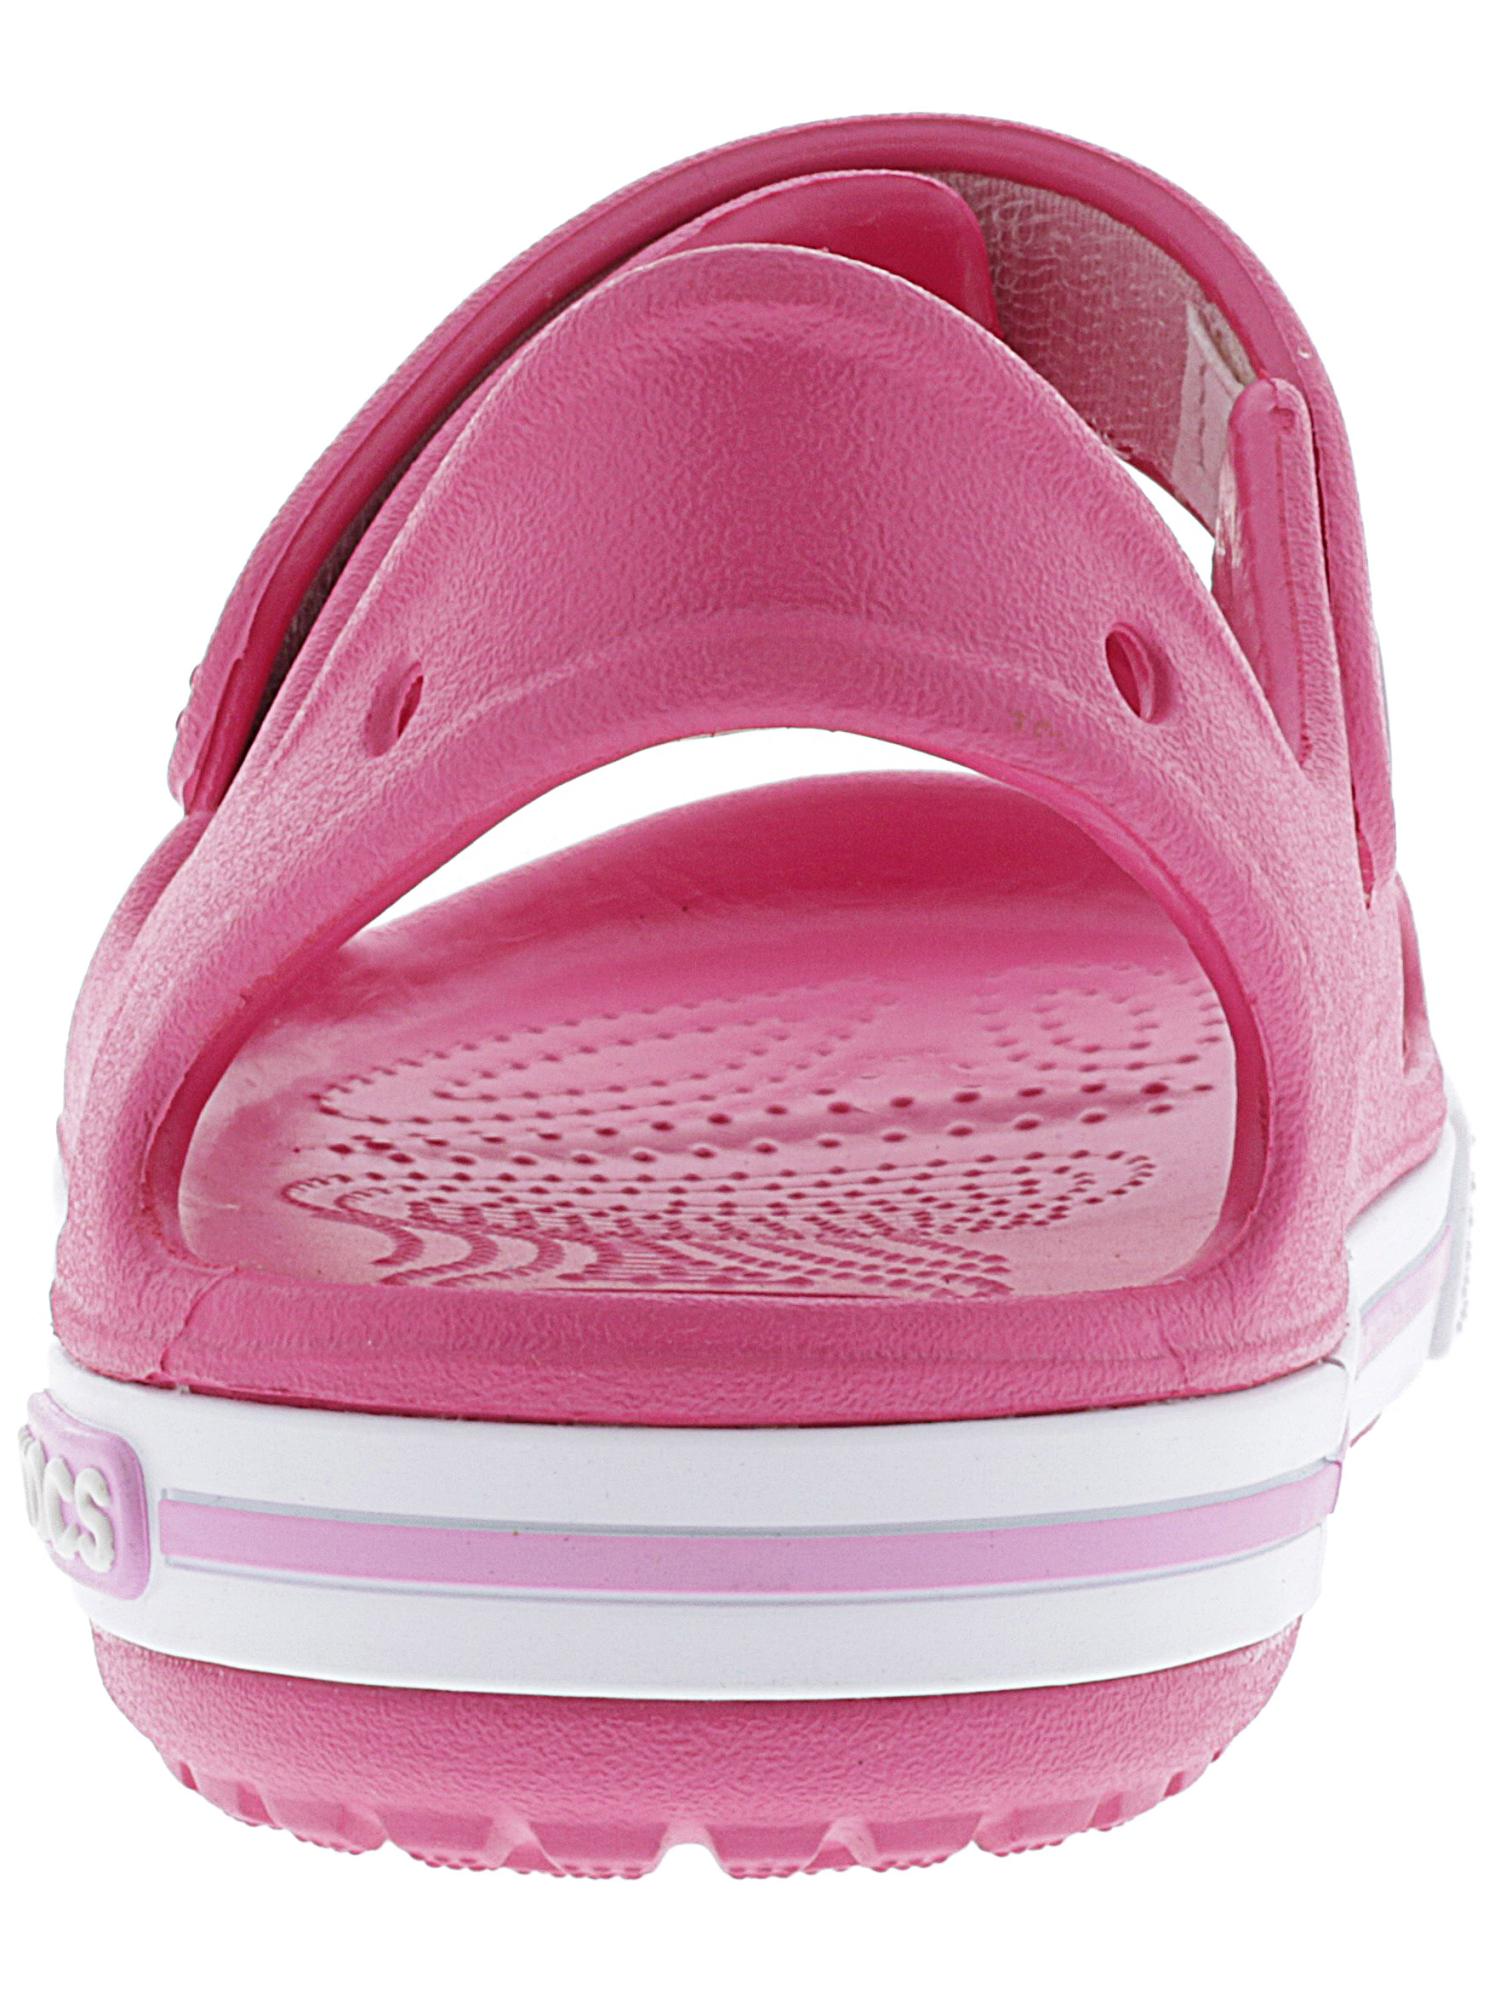 74b8544fb Crocs Kids Crocband II Sandal Paradise Pink   Carnation Ankle-high ...